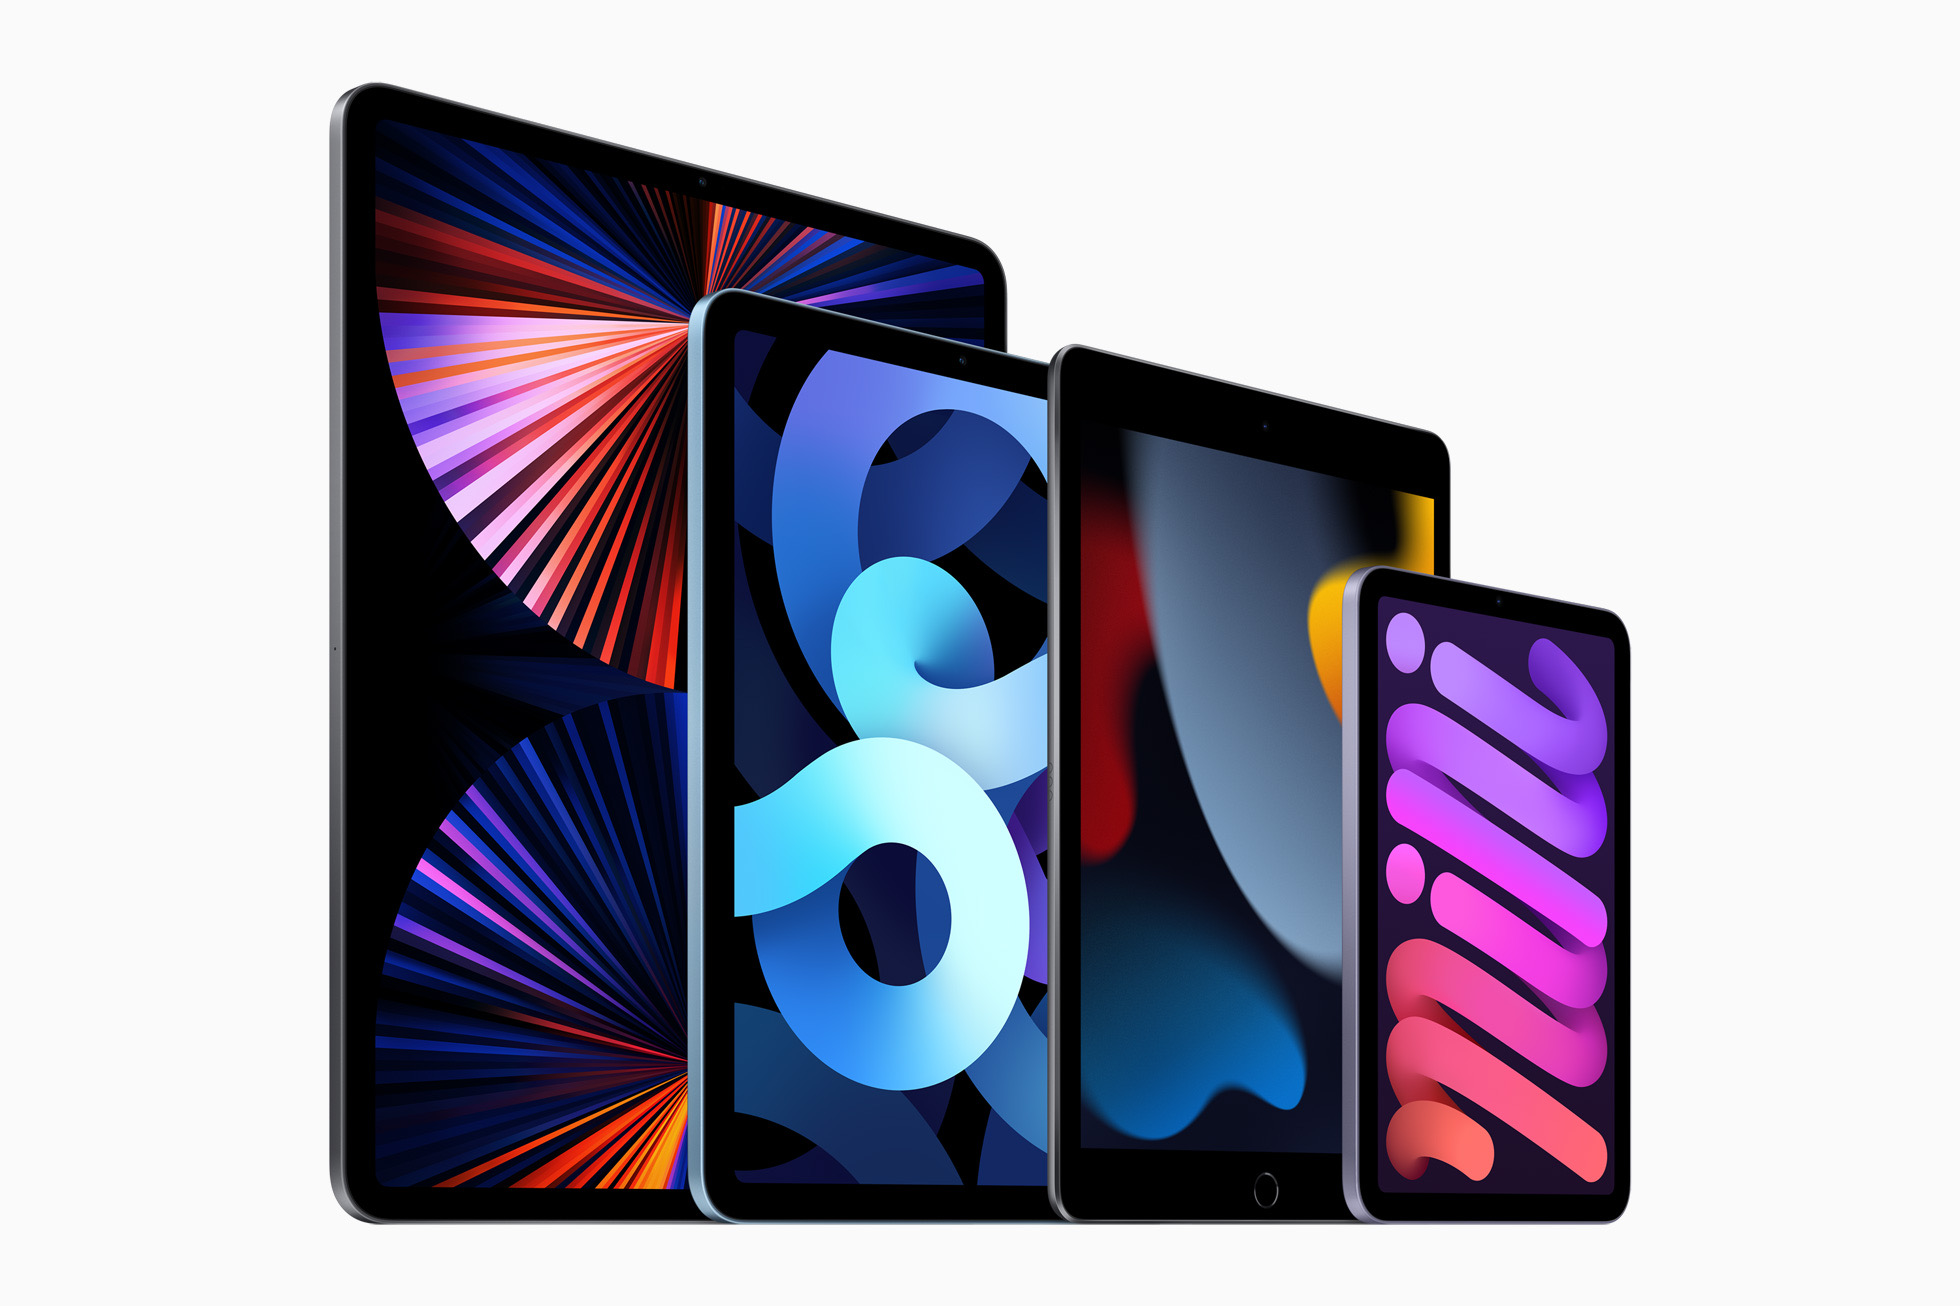 Apple iPad mini ipad family lineup 09142021